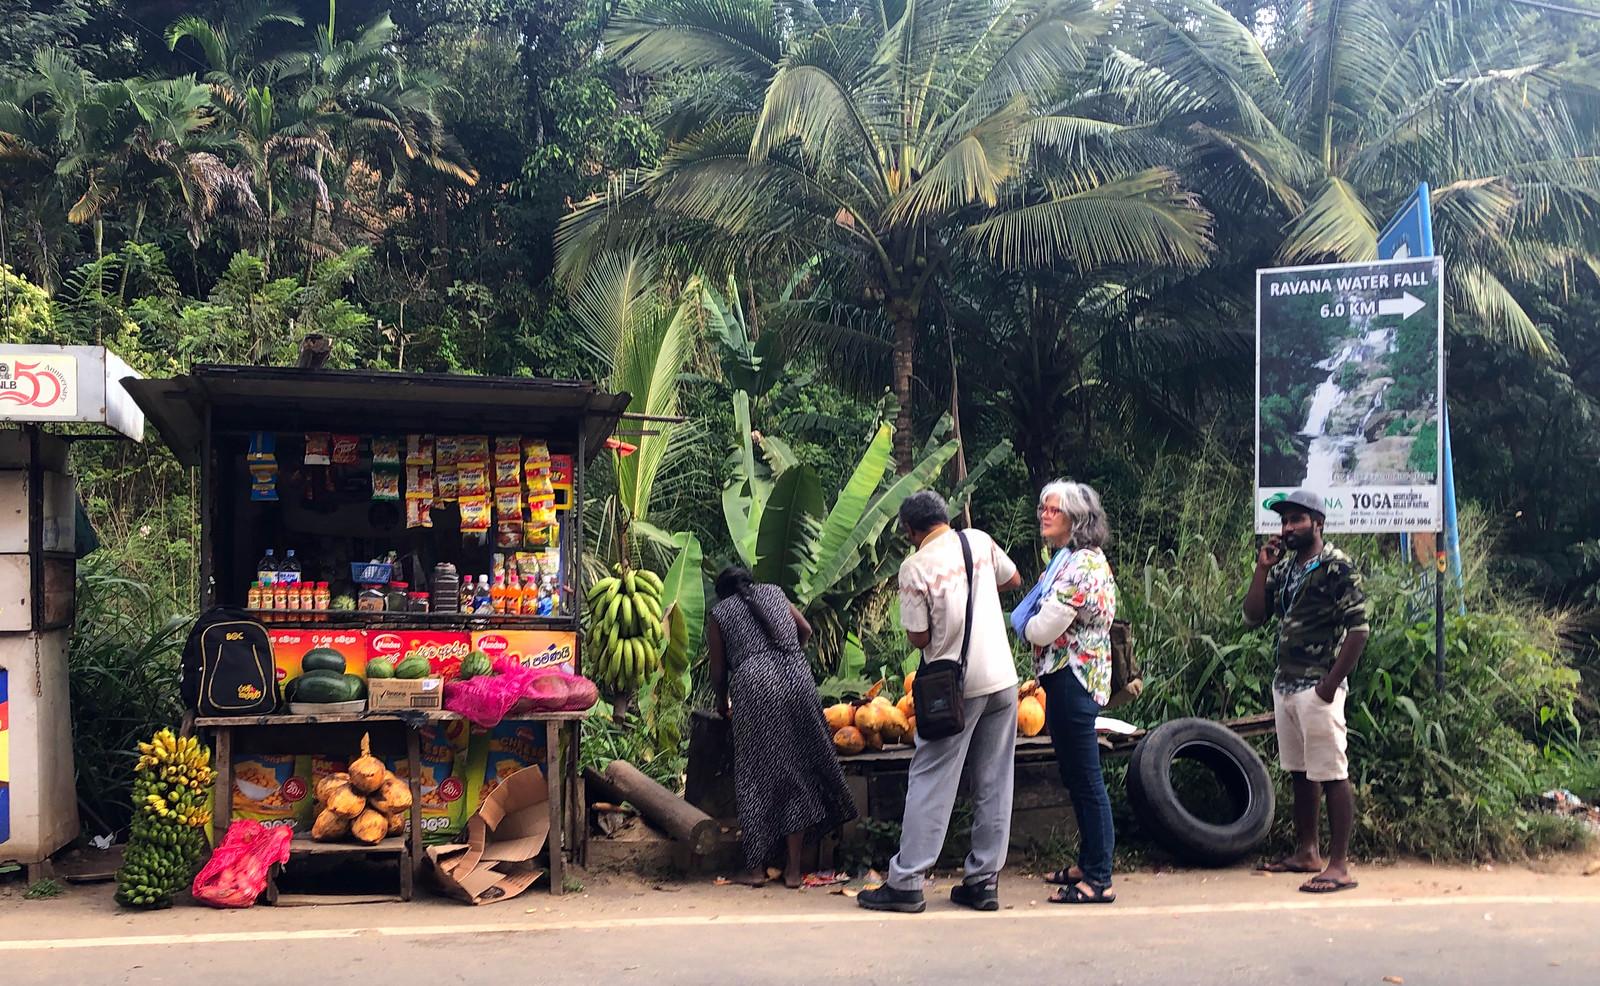 Tren de Ella, Ella Railway - Sri Lanka tren de ella - 31954656167 b49151cc35 h - Tren de Ella en Sri Lanka: ¿El viaje en tren más pintoresco del mundo?